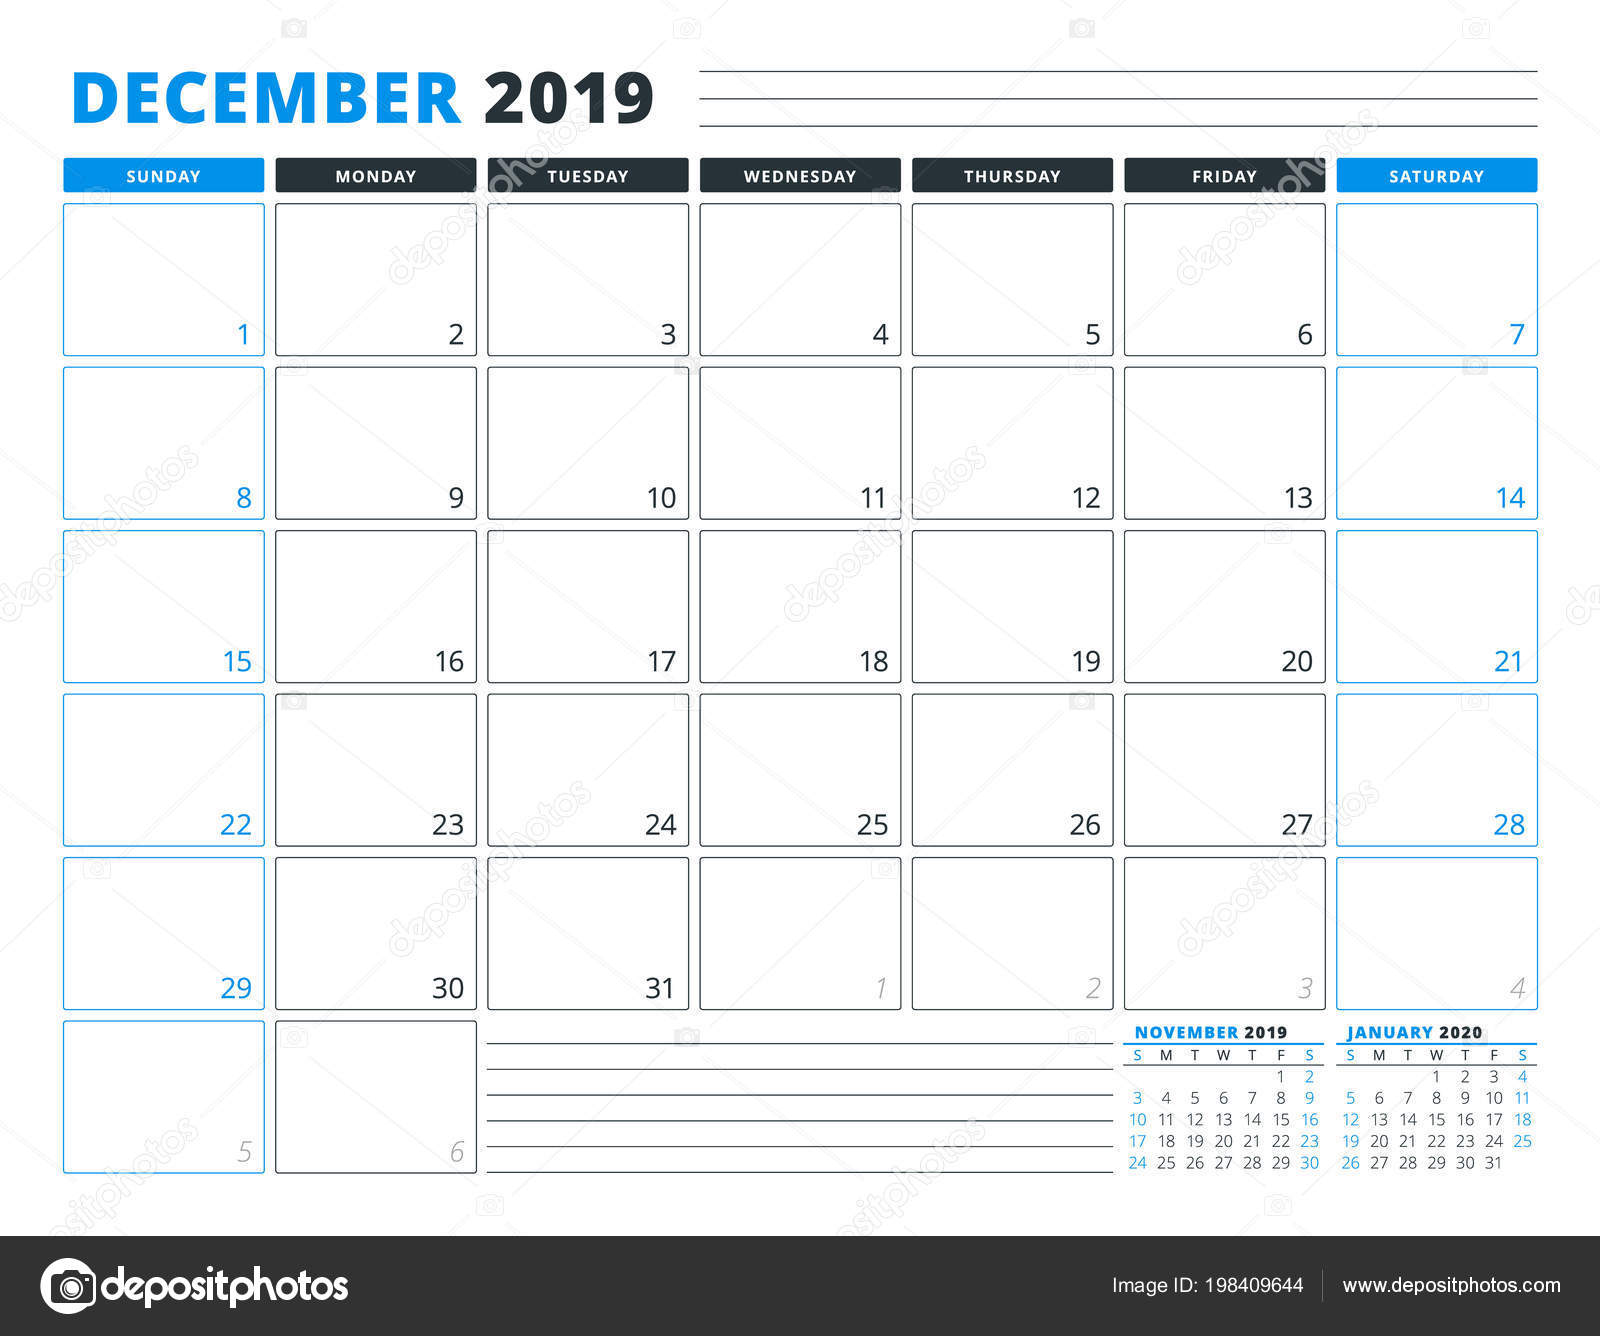 17 Aralık 2019 Cuma